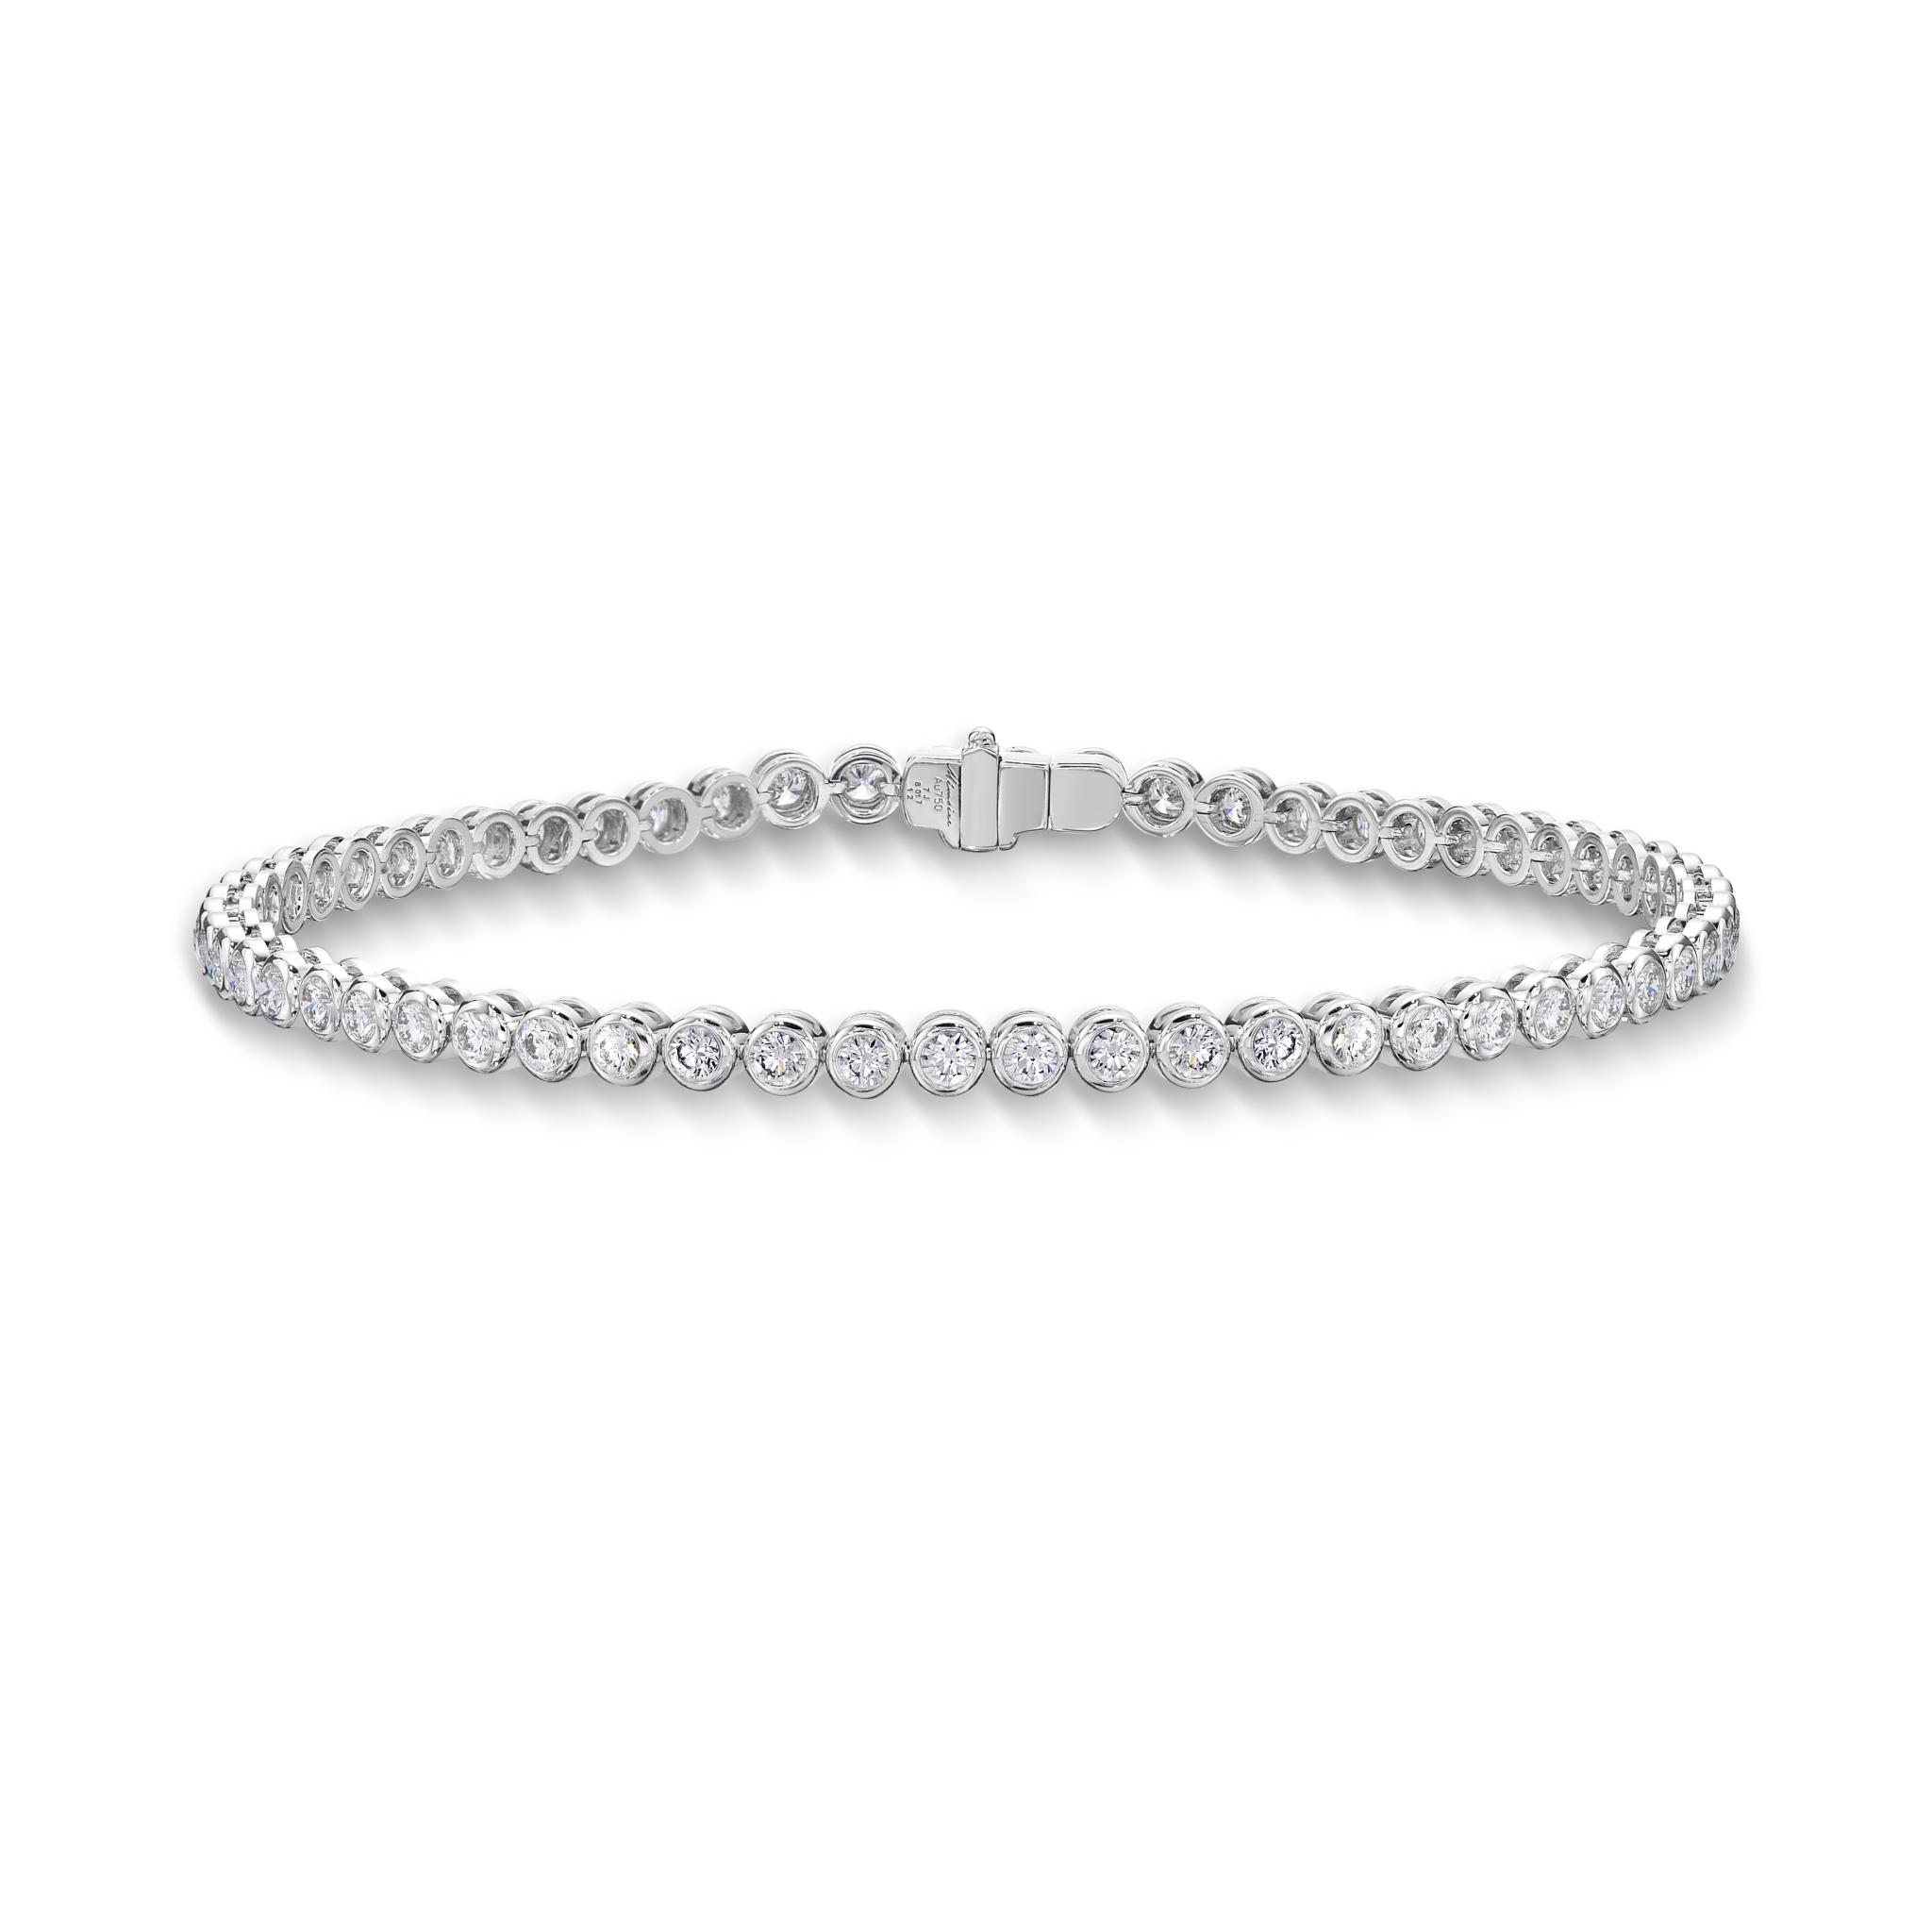 Memoire 18ct White Gold 1 Carat Diamond Bezal Tennis Bracelet